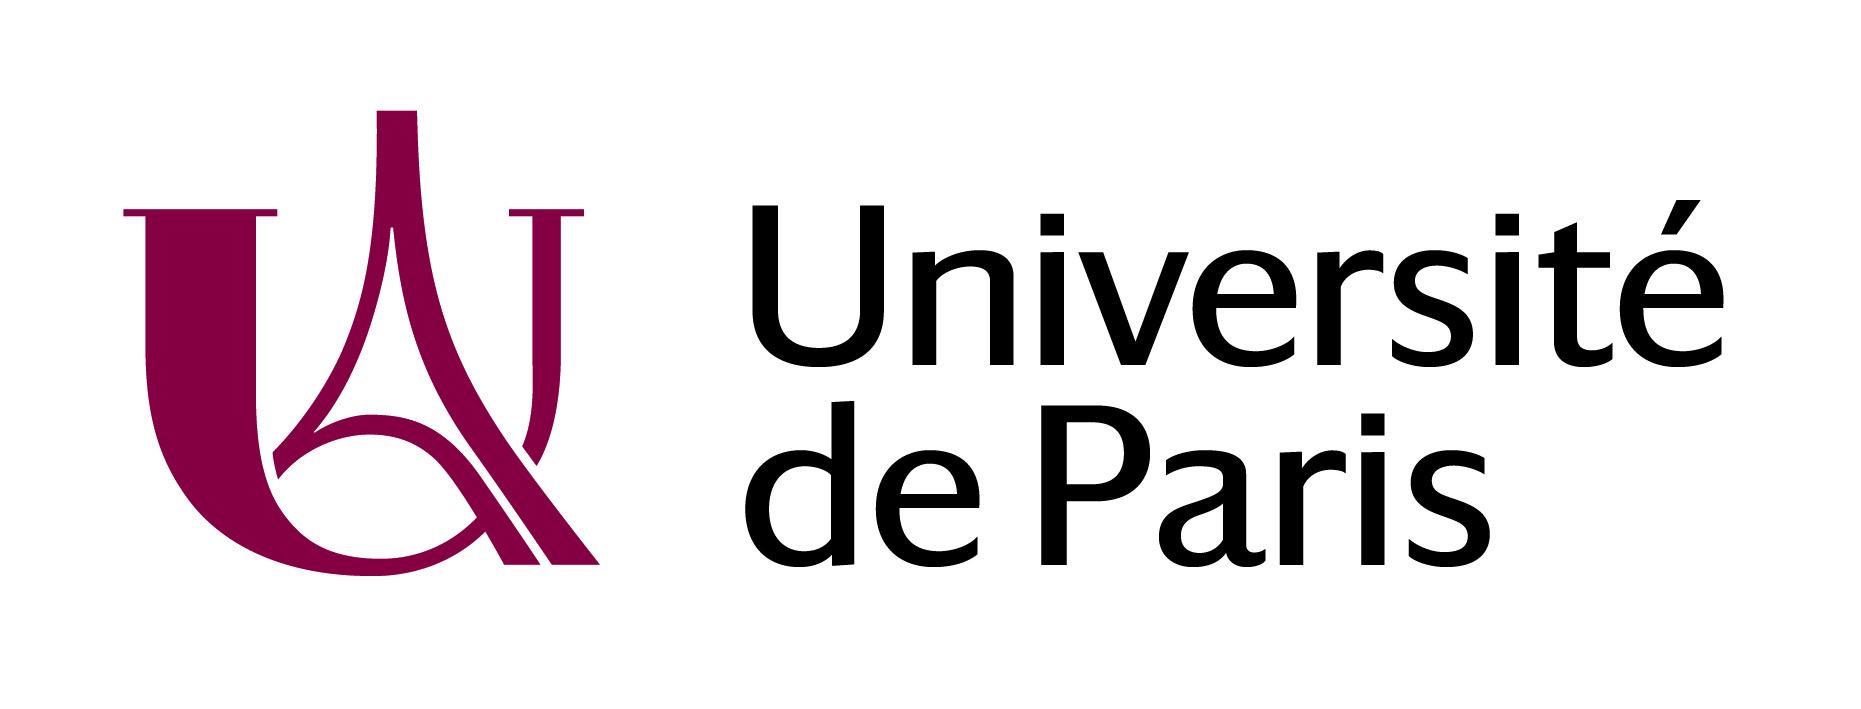 UniversiteParis_logo_horizontal_couleur_CMJN.jpg